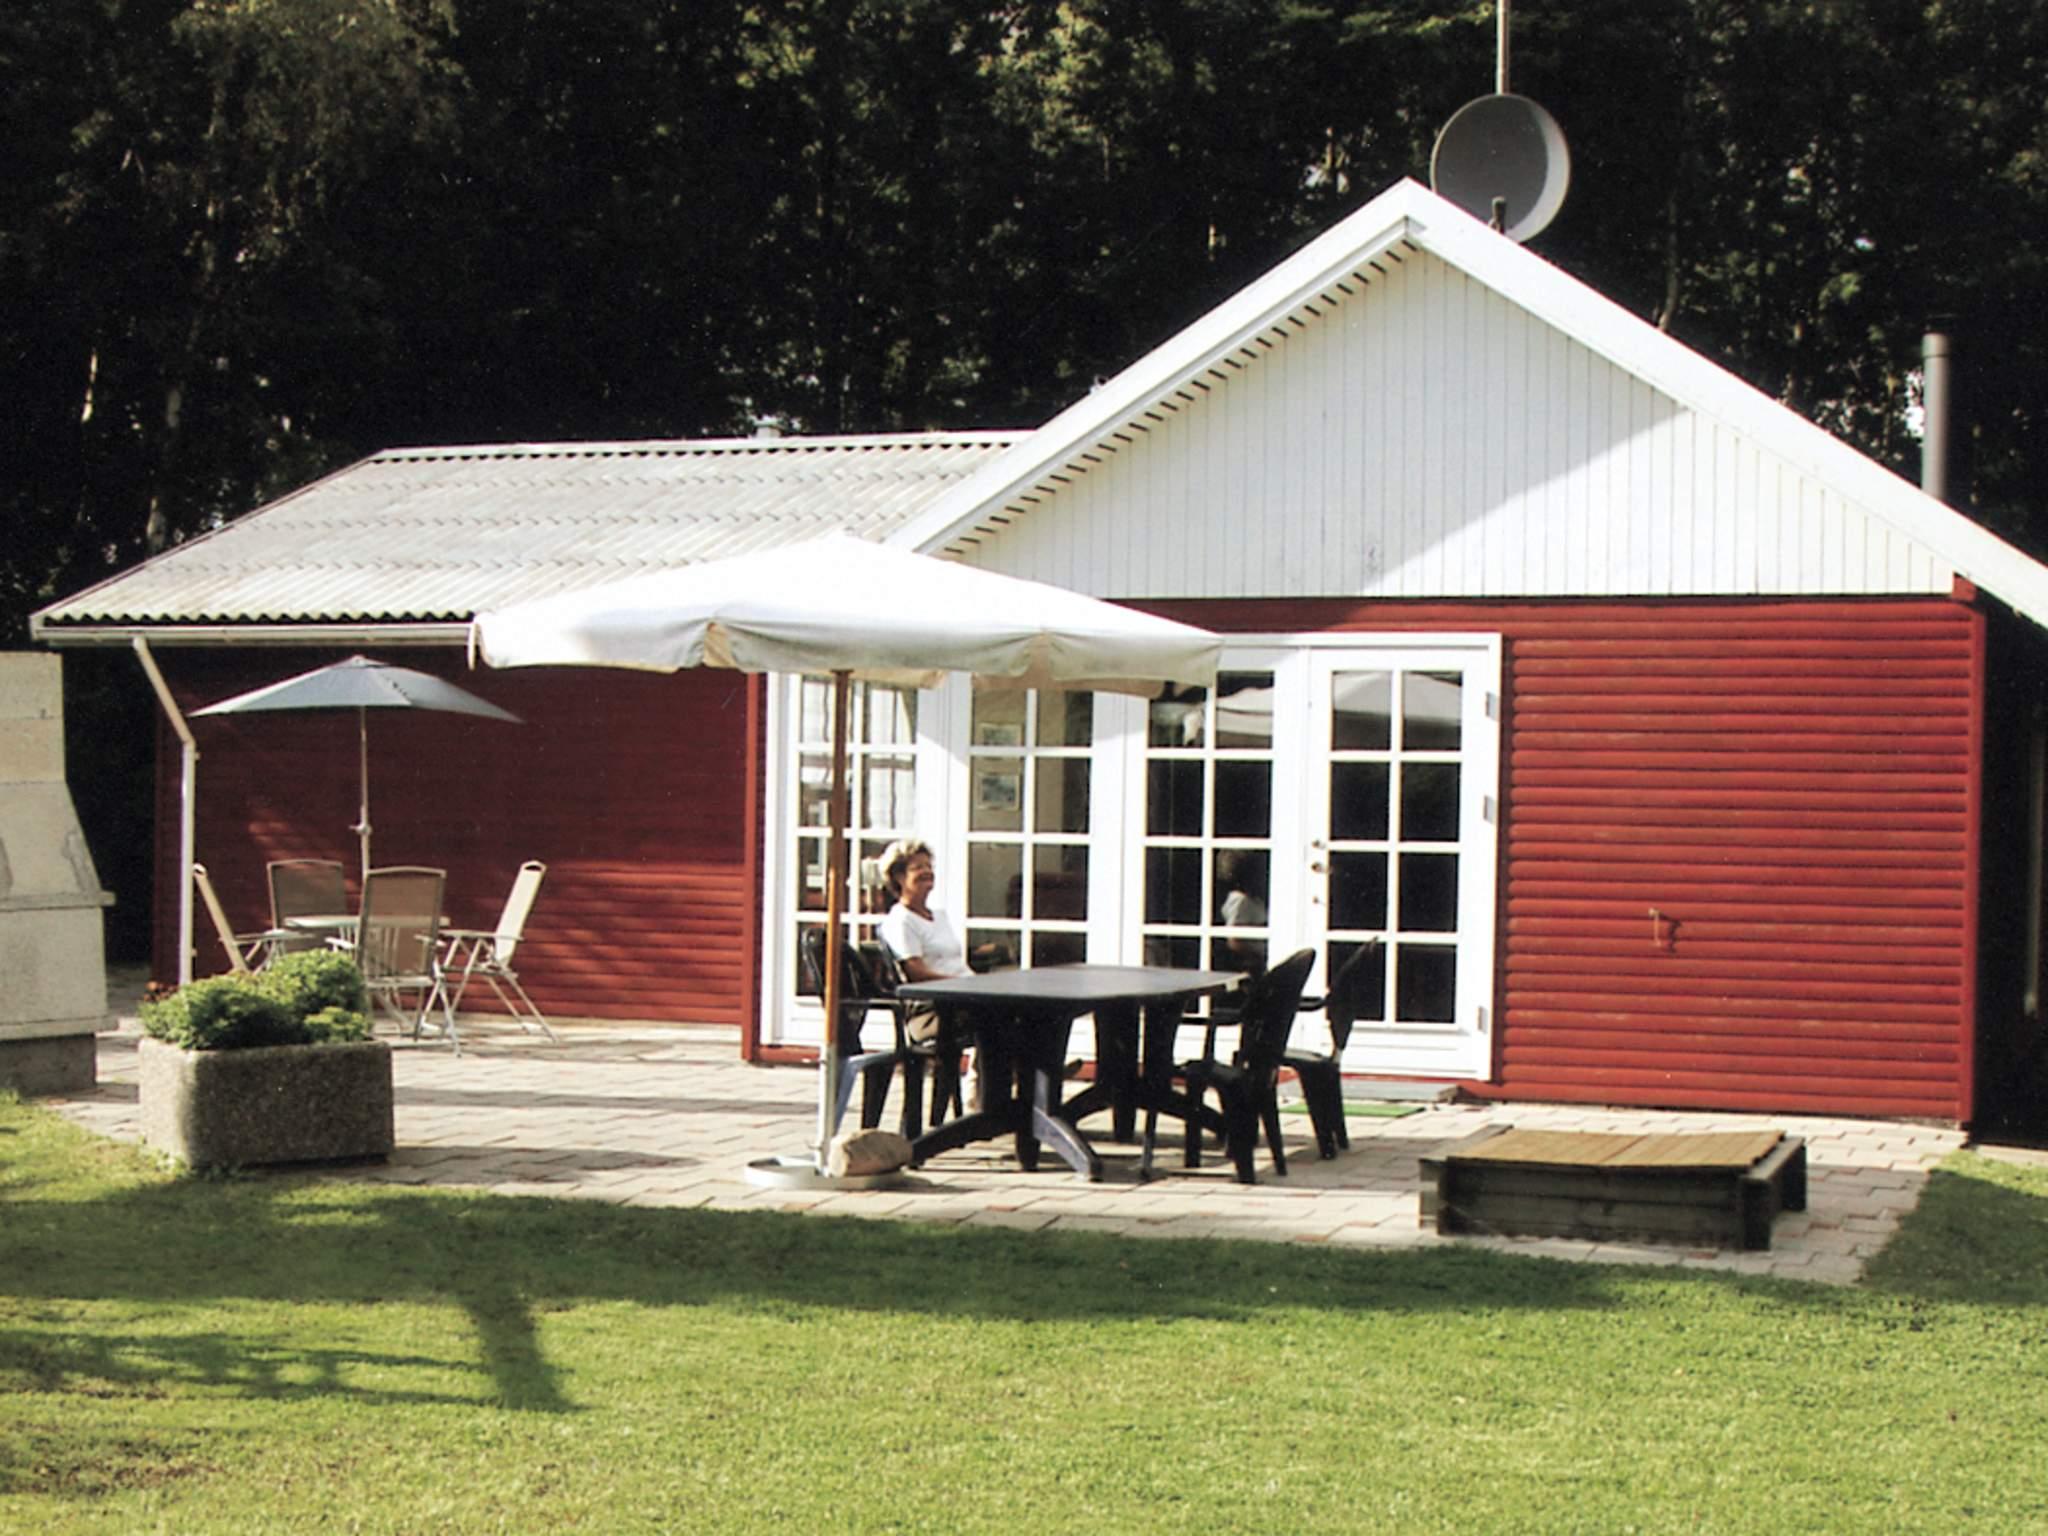 Ferienhaus Skovmose/Als (82561), Skovby, , Südostjütland, Dänemark, Bild 1